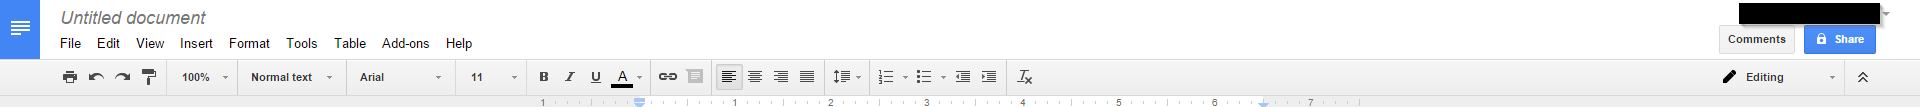 Google doc navigation panel